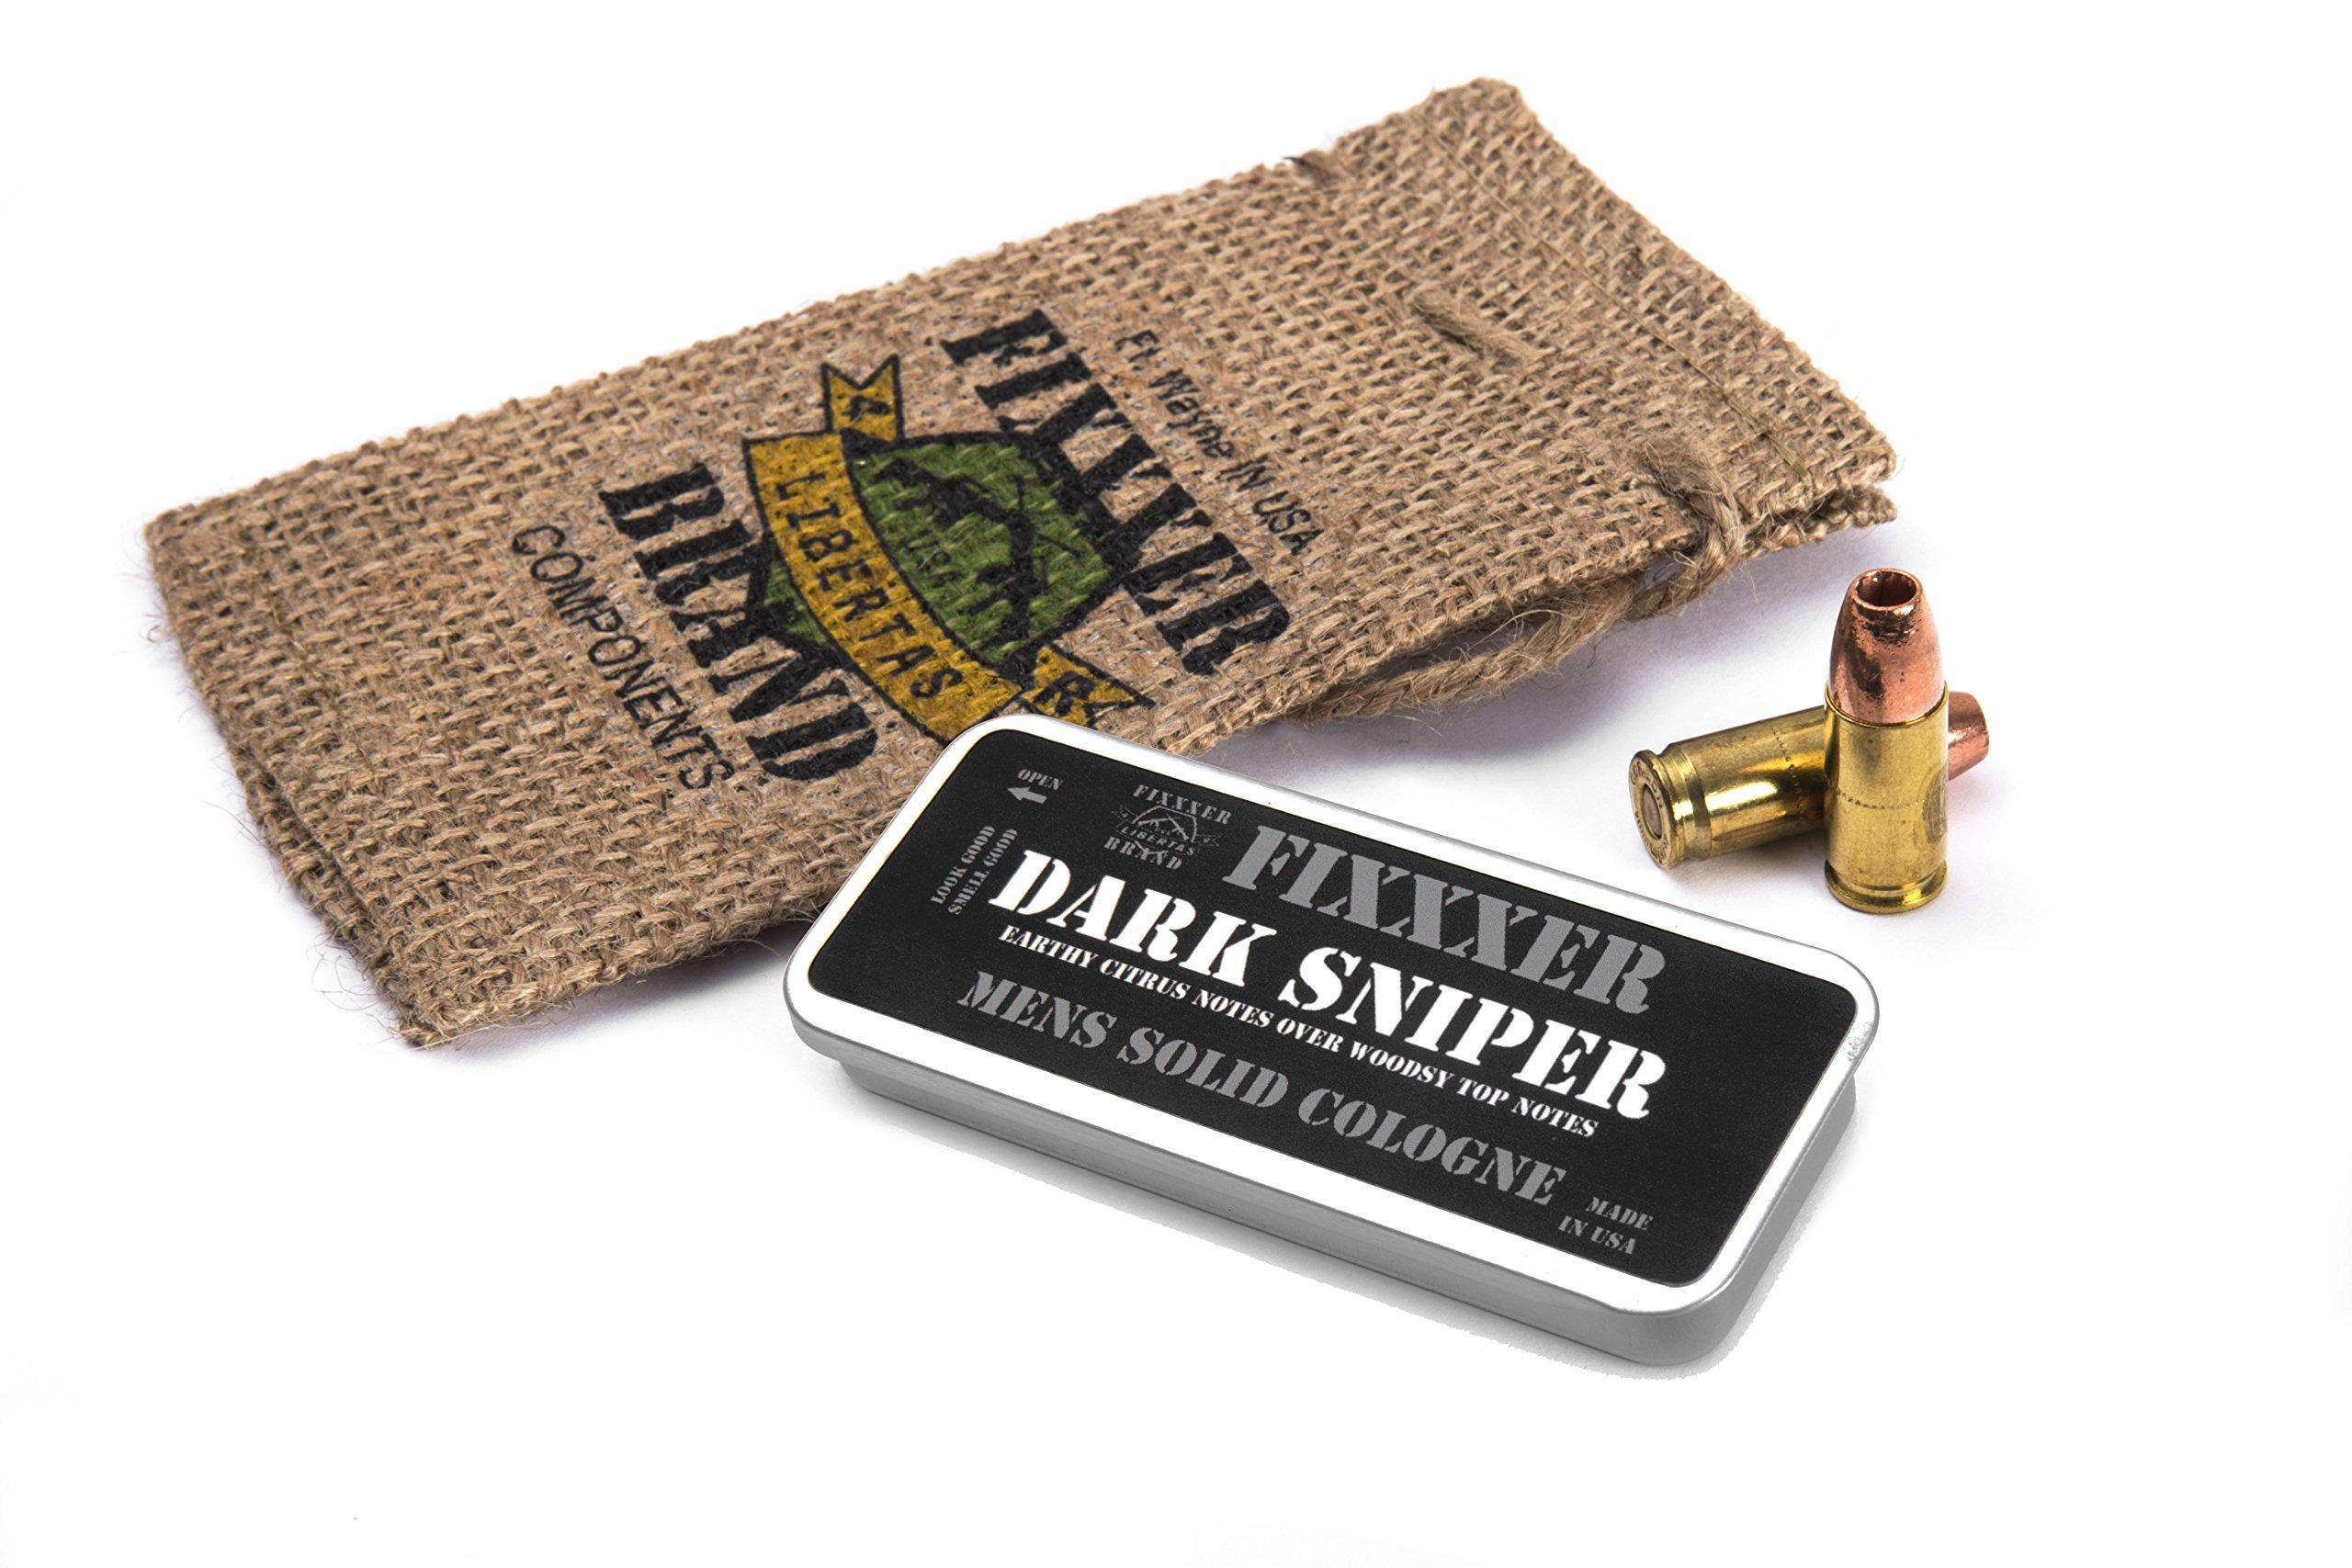 "Natural Men's Solid Cologne ""DARK SNIPER"" (18g) metal tin, Fixxxer Brand"